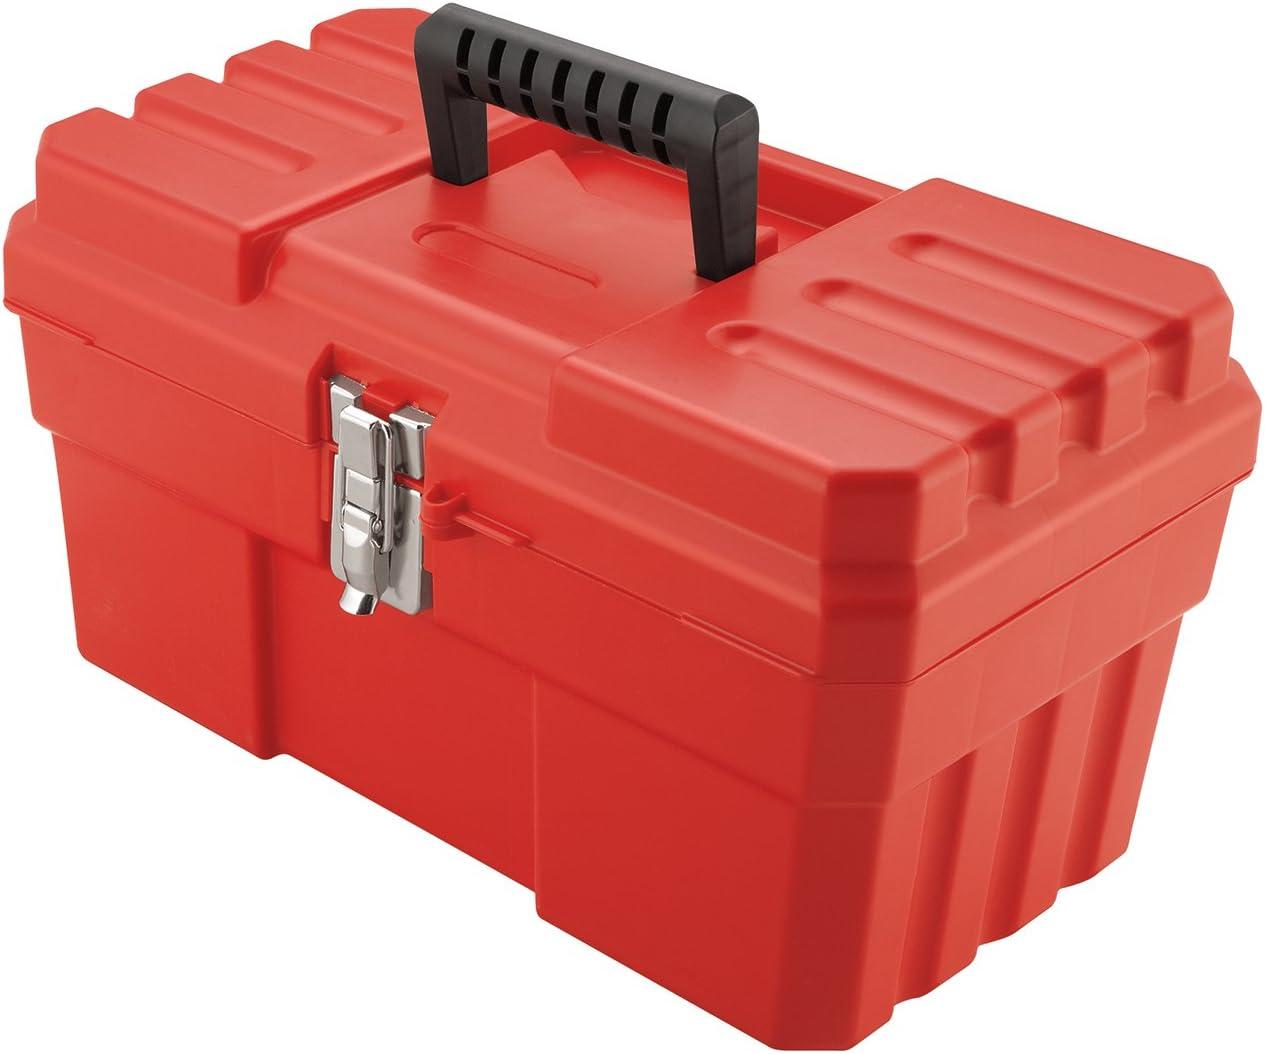 Akro-Mils ProBox 14-Inch Plastic Toolbox